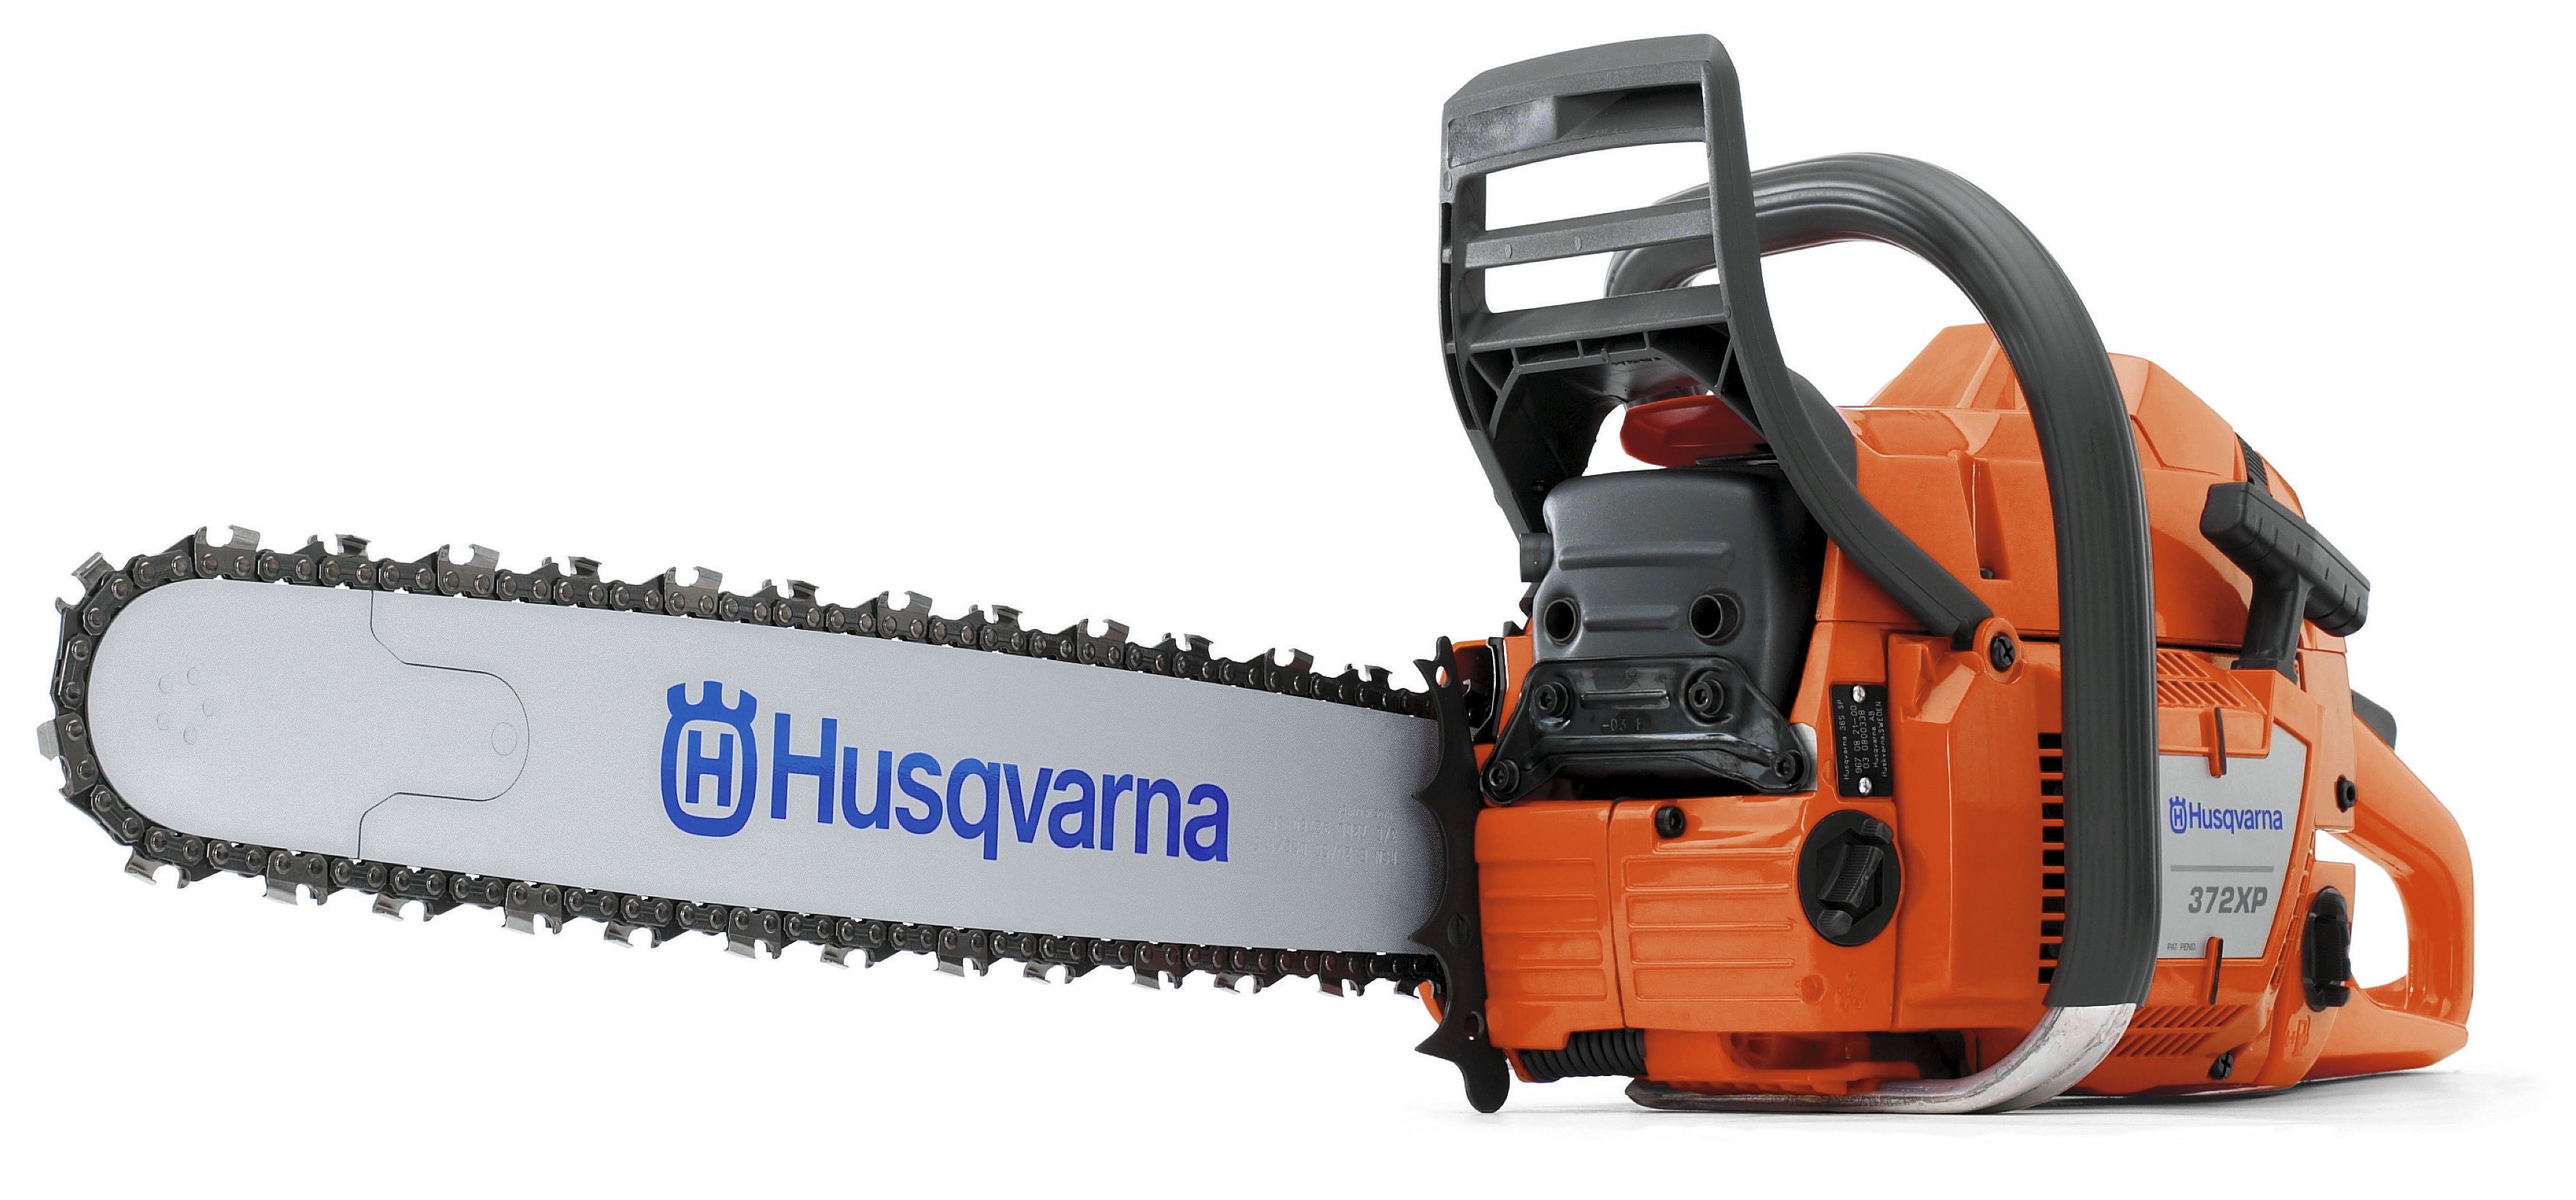 husqvarna 362 - husqvarna 371 - husqvarna 372 - husqvarna, husqvarna aftermarket parts, husqvarna replacement parts